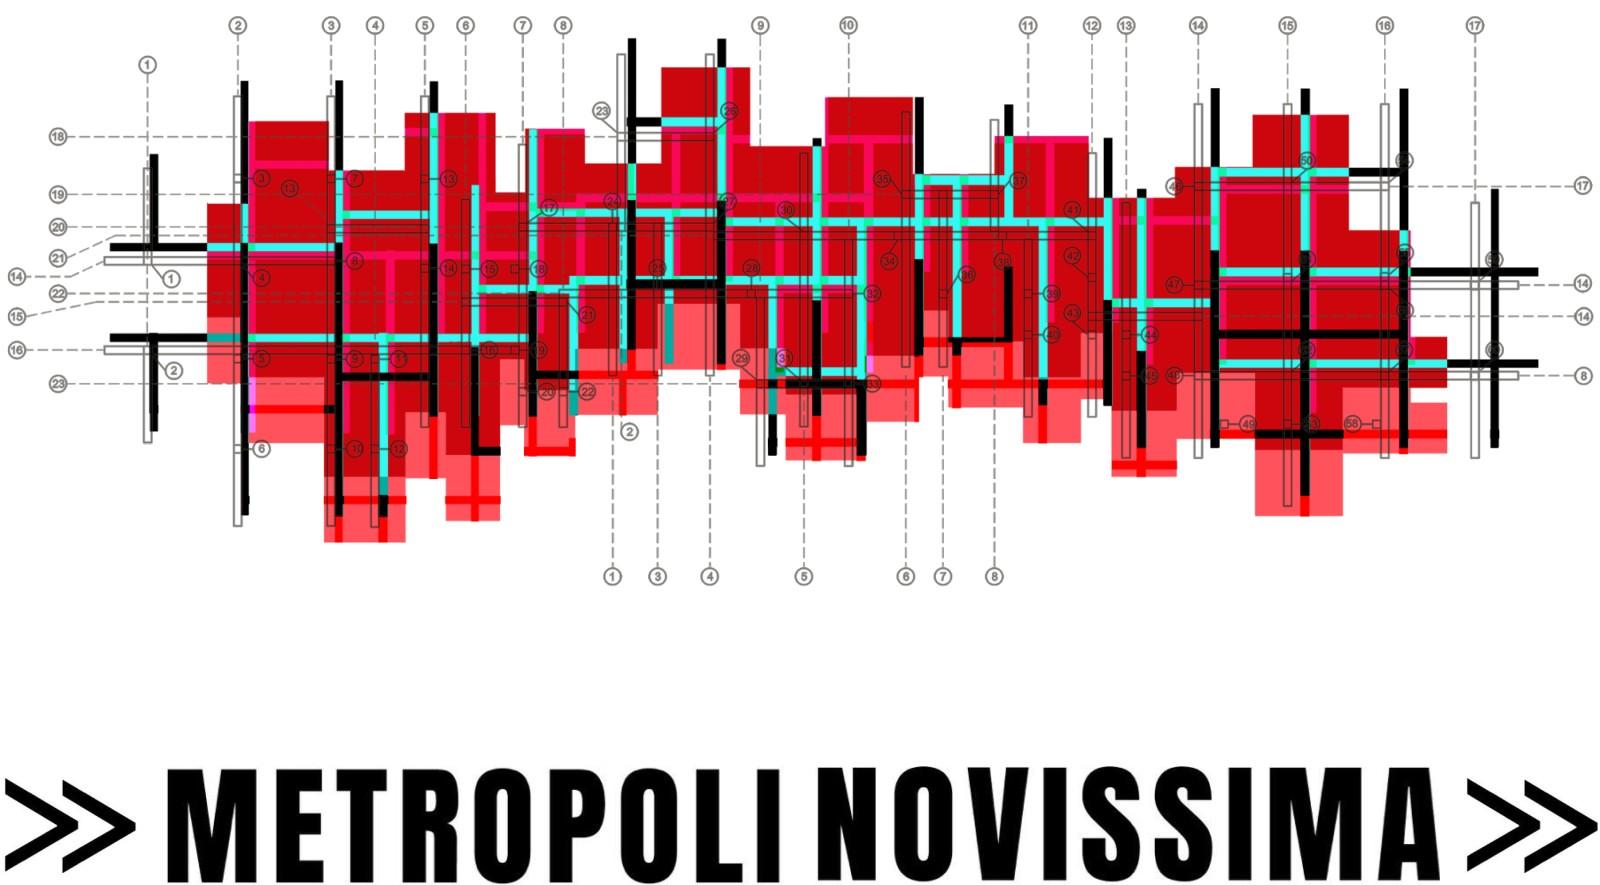 Metropoli Novissima